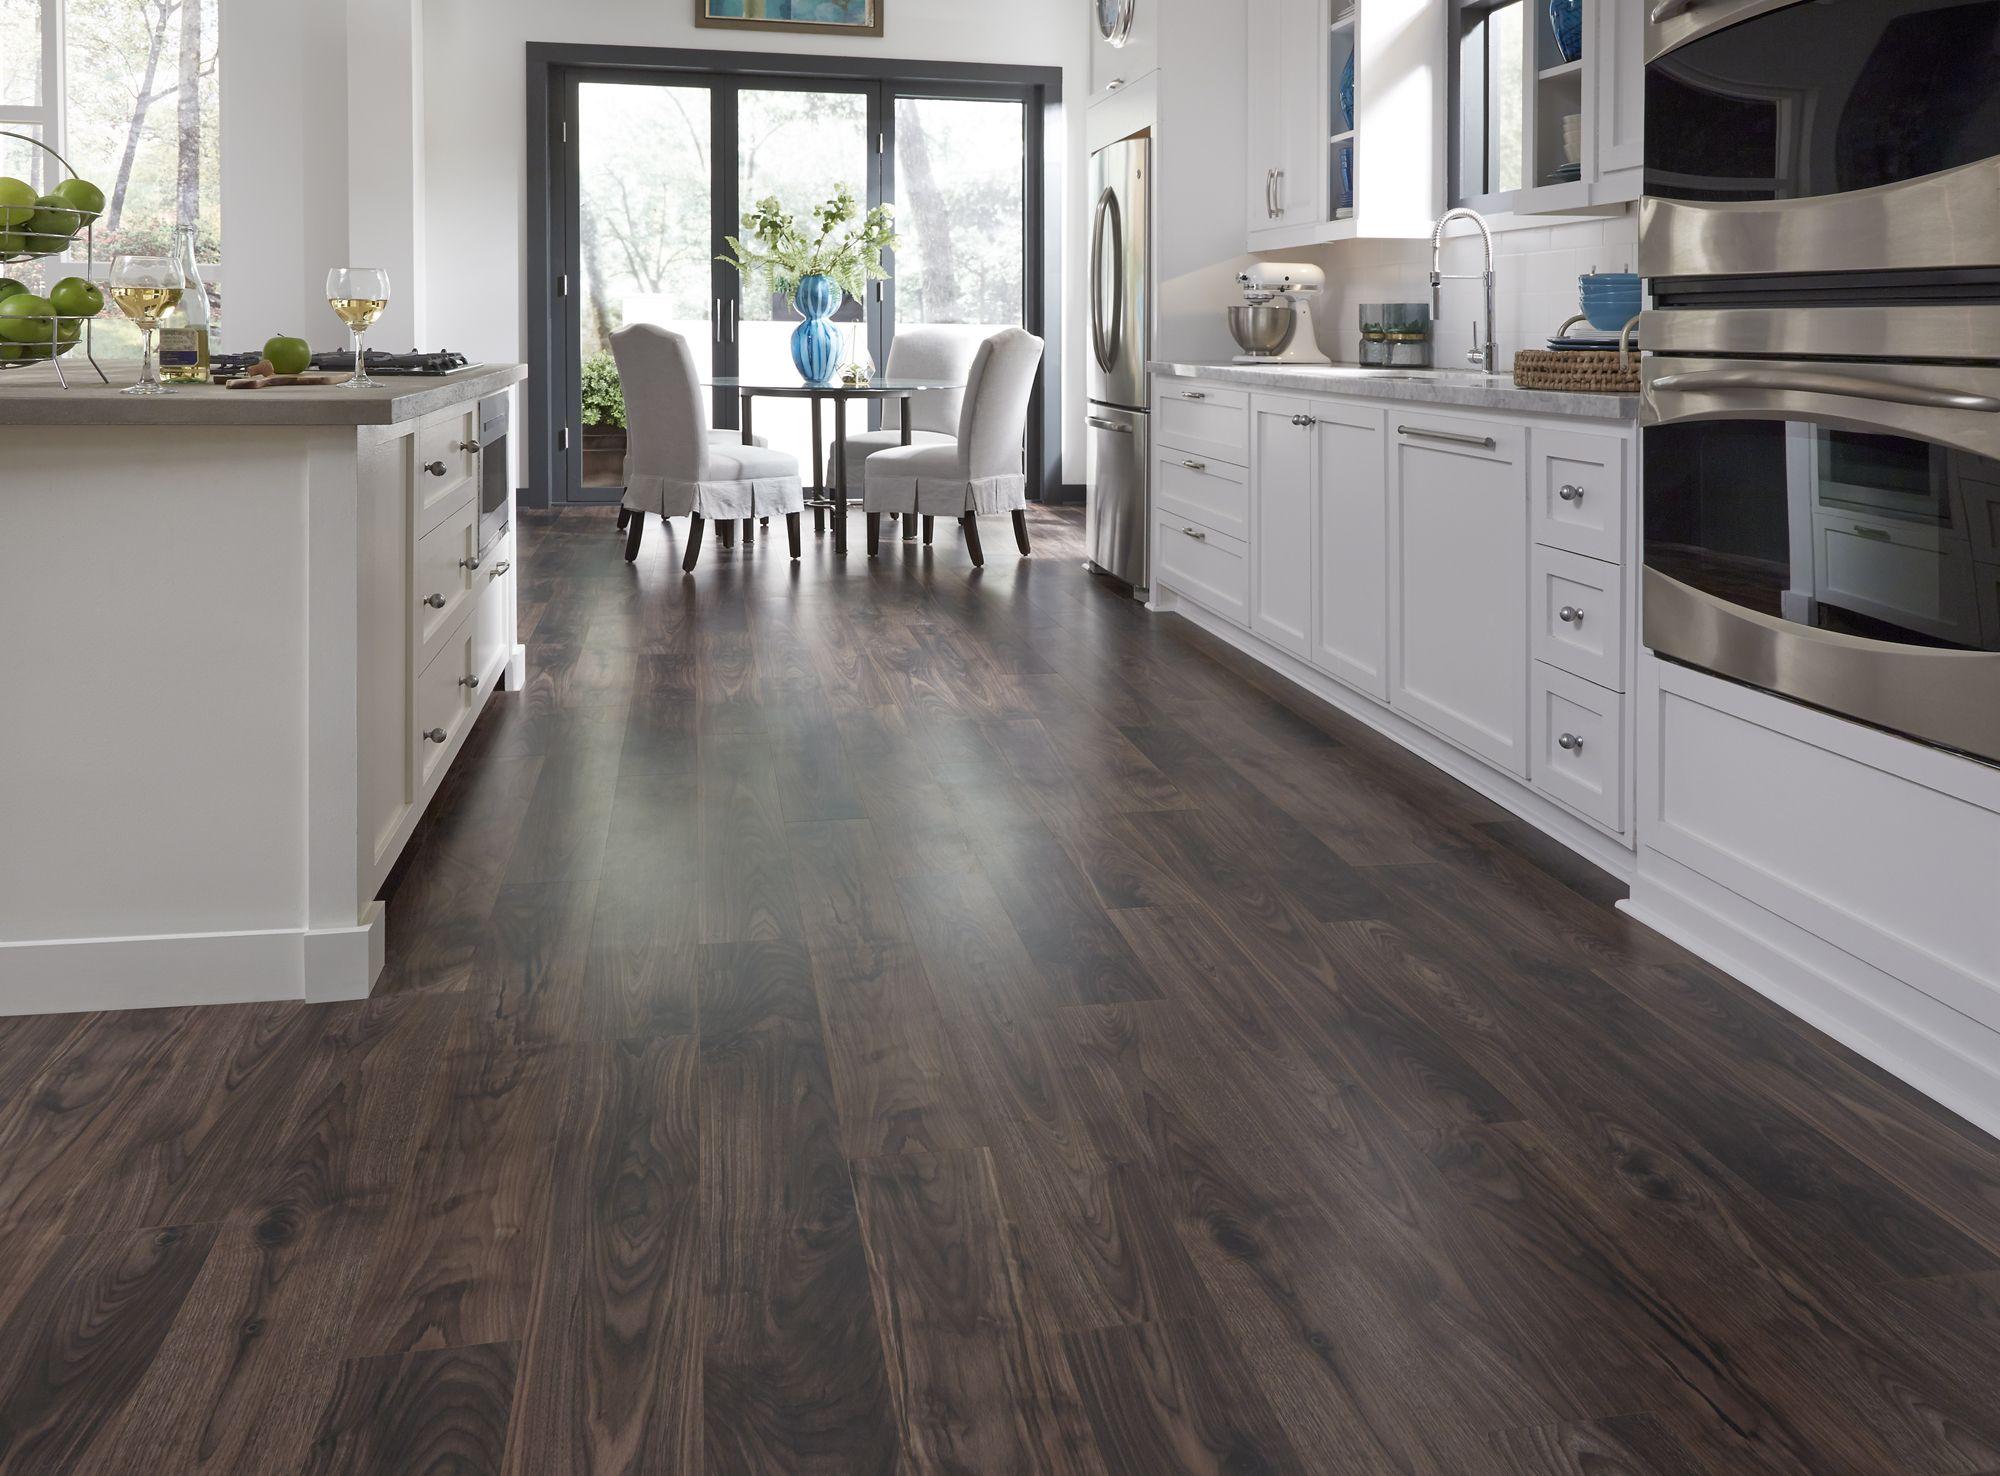 wood tile floors felsen click ceramic plank is the next evolution of wood-look tile - no XXAGXJT